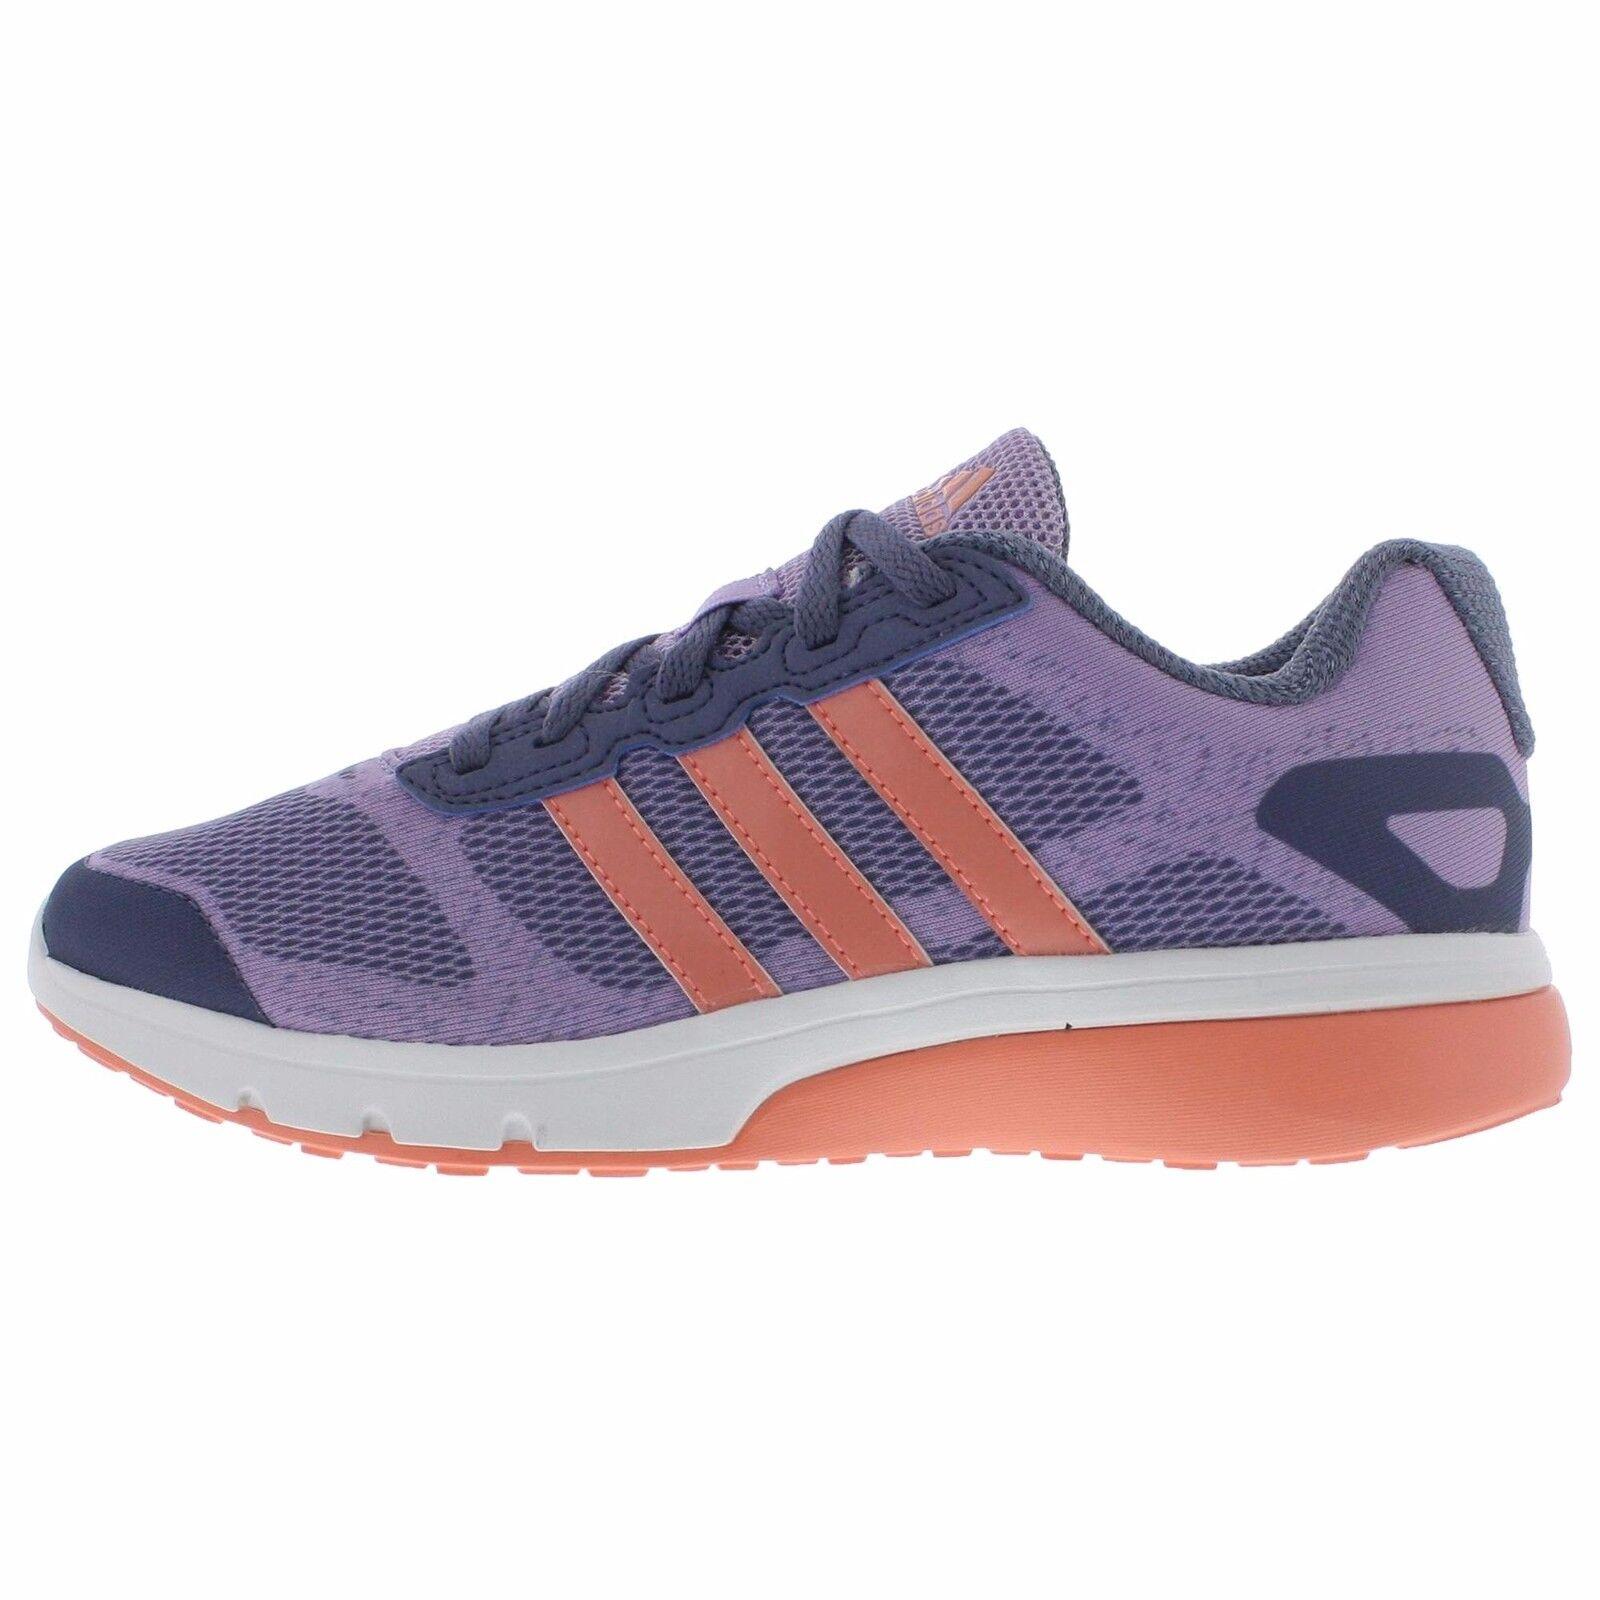 2f3abcc7ede Adidas Women s Turbo 3.1w Running Running Running Sneakers AF6651 NWT NIB  Purple Orange Shoes 01be89